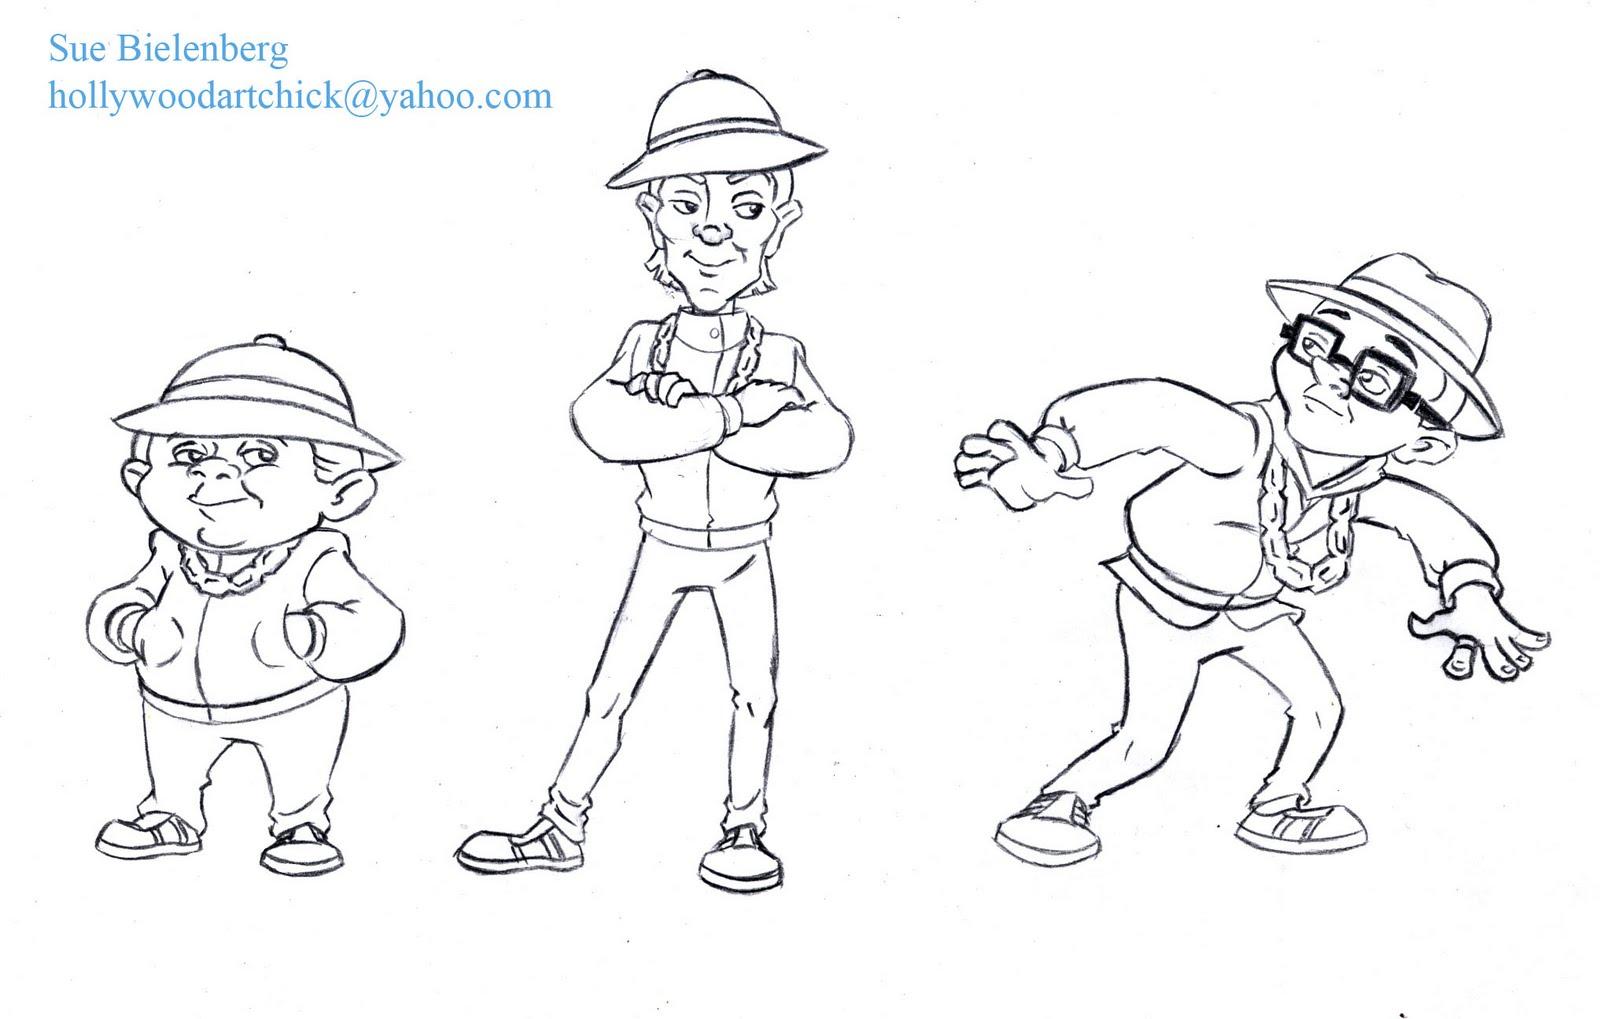 Cartoon Character Design Price : Cartoon character designs marshmallow mouse